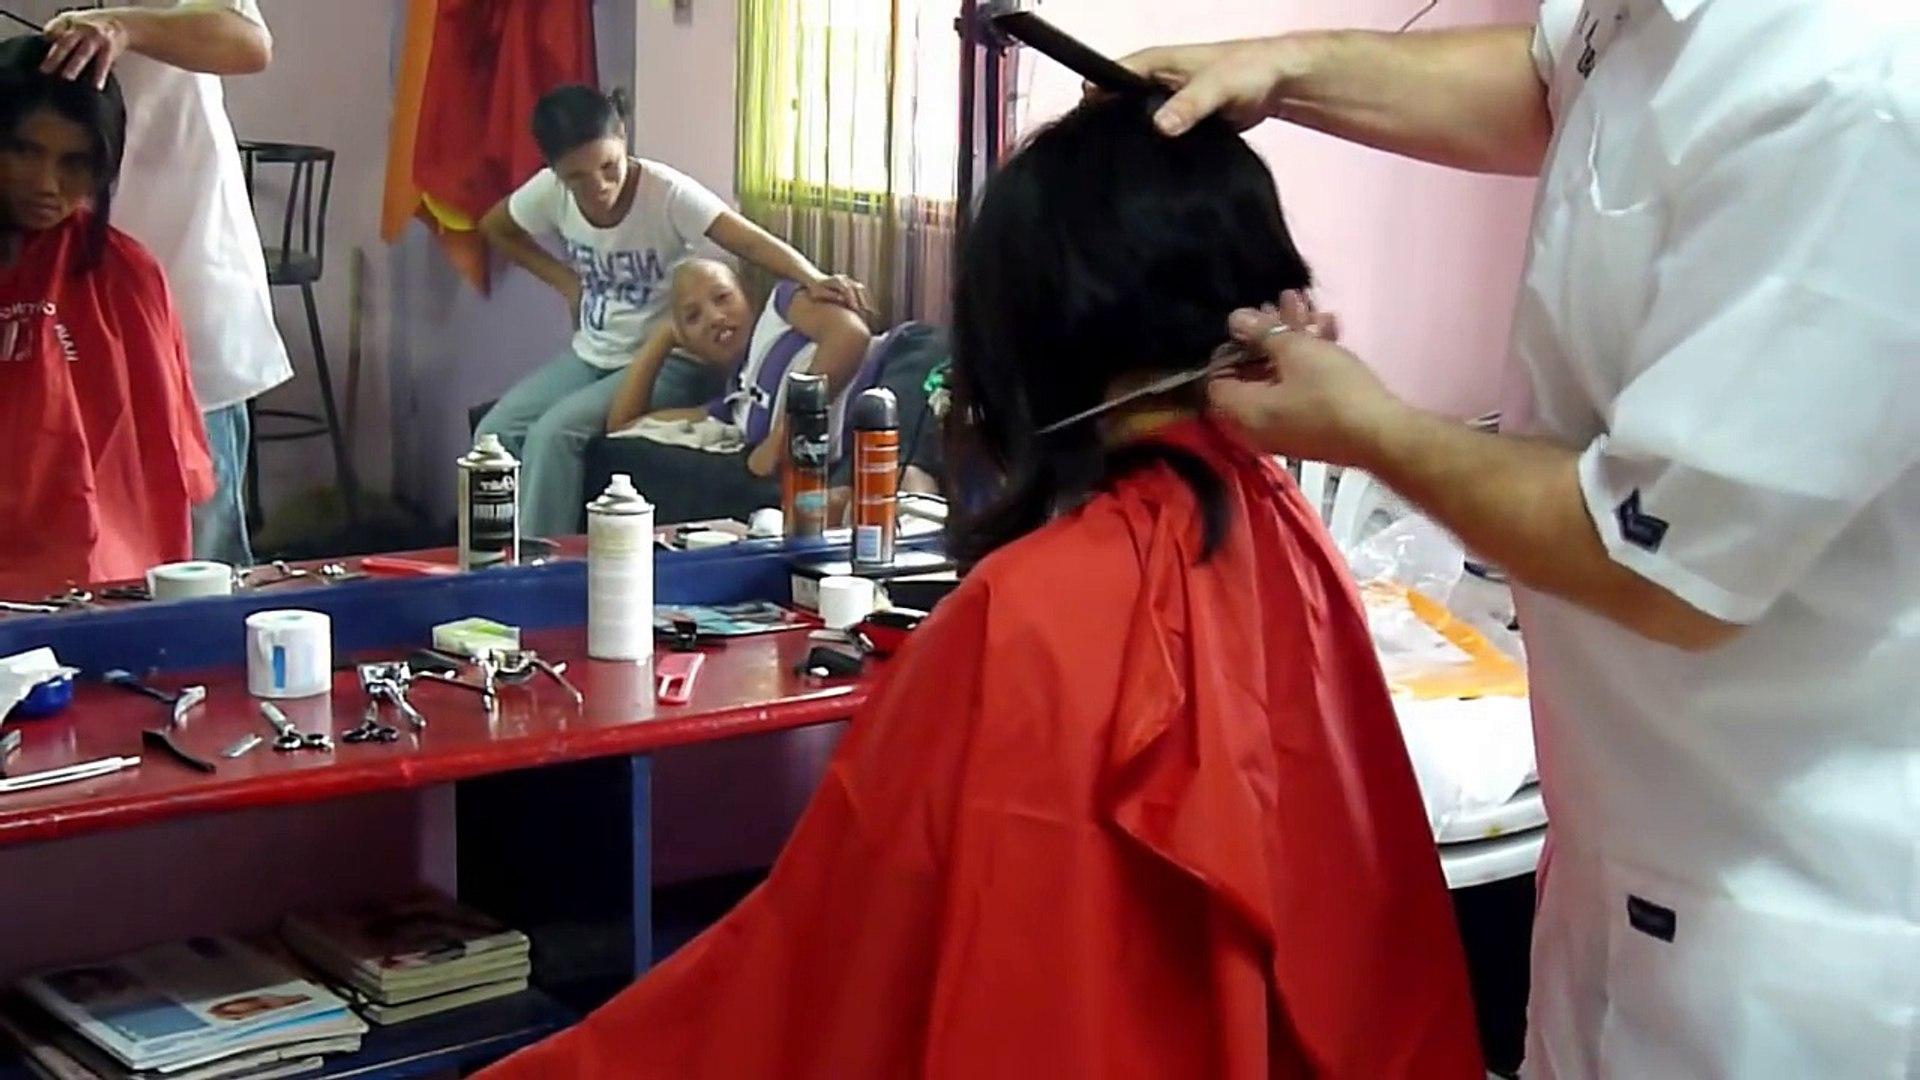 Girl long to short hair cut - video dailymotion